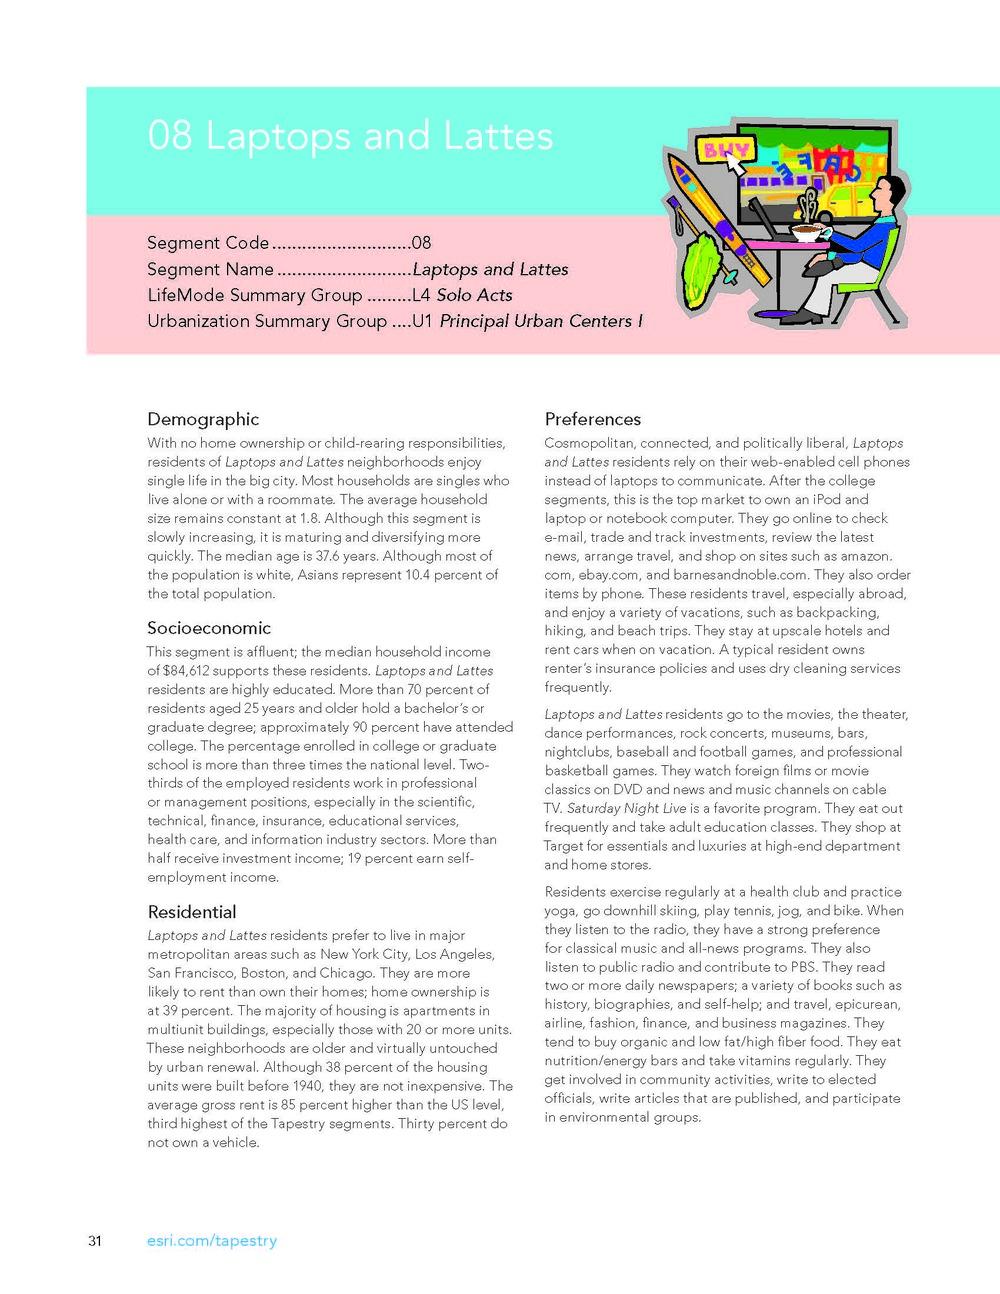 tapestry-segmentation_Page_34.jpg